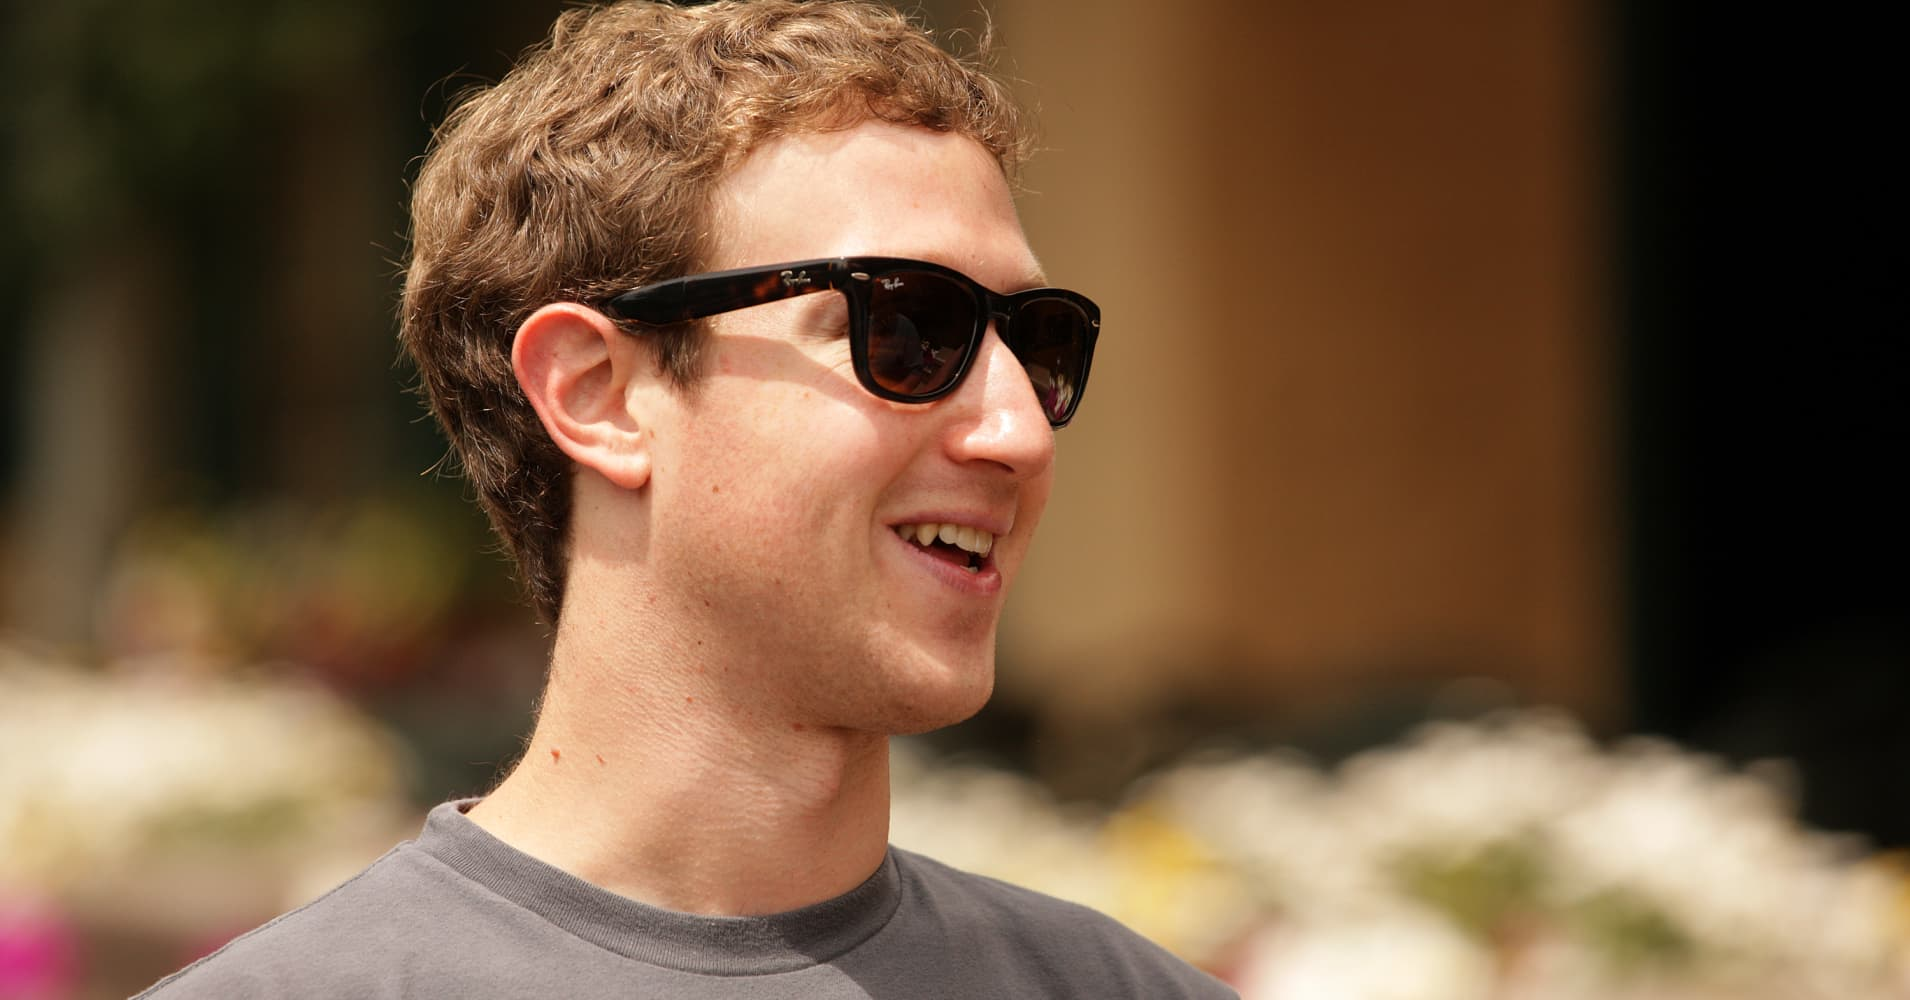 Mark Zuckerberg suing Hawaiians to force property sale